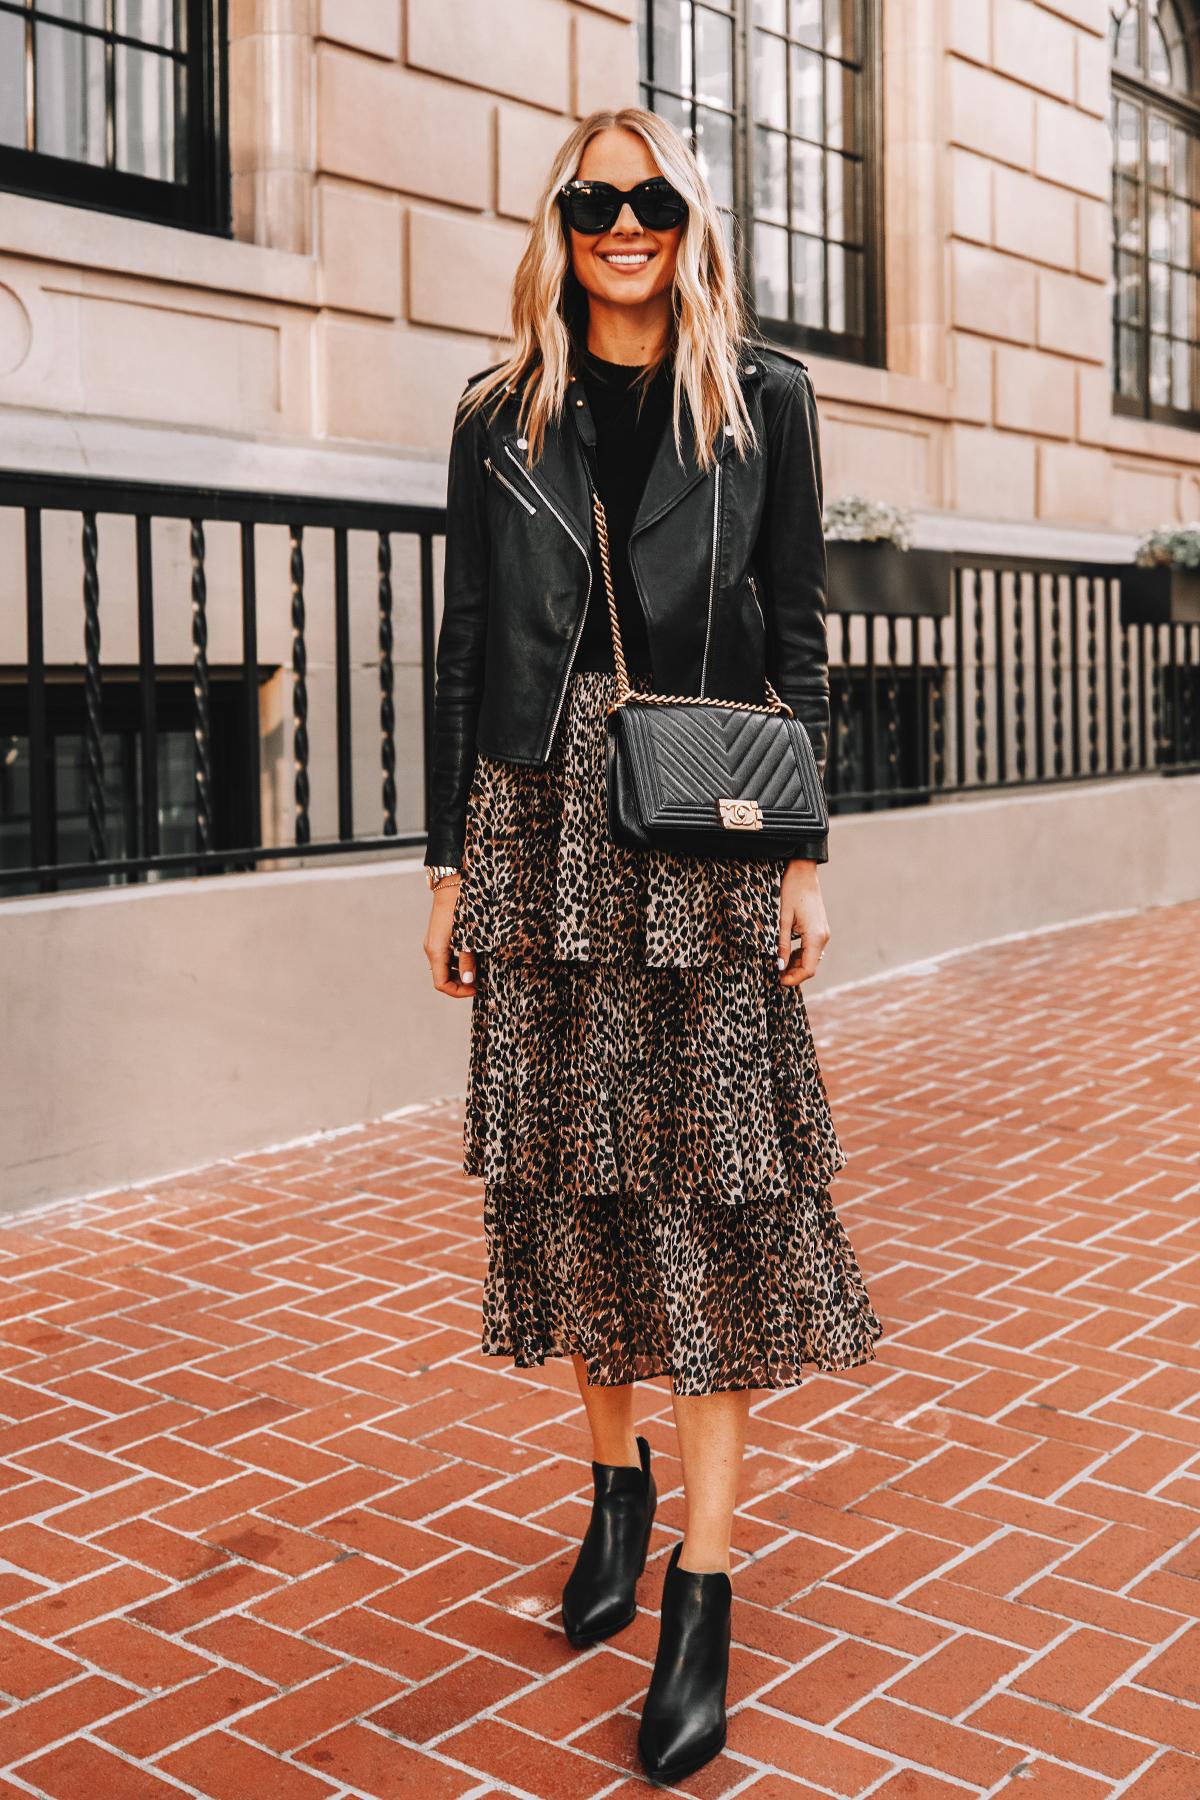 Fashion Jackson Wearing Black Leather Jacket Black Sweater Topshop Leopard Midi Skirt Black Booties Chanel Boy Bag